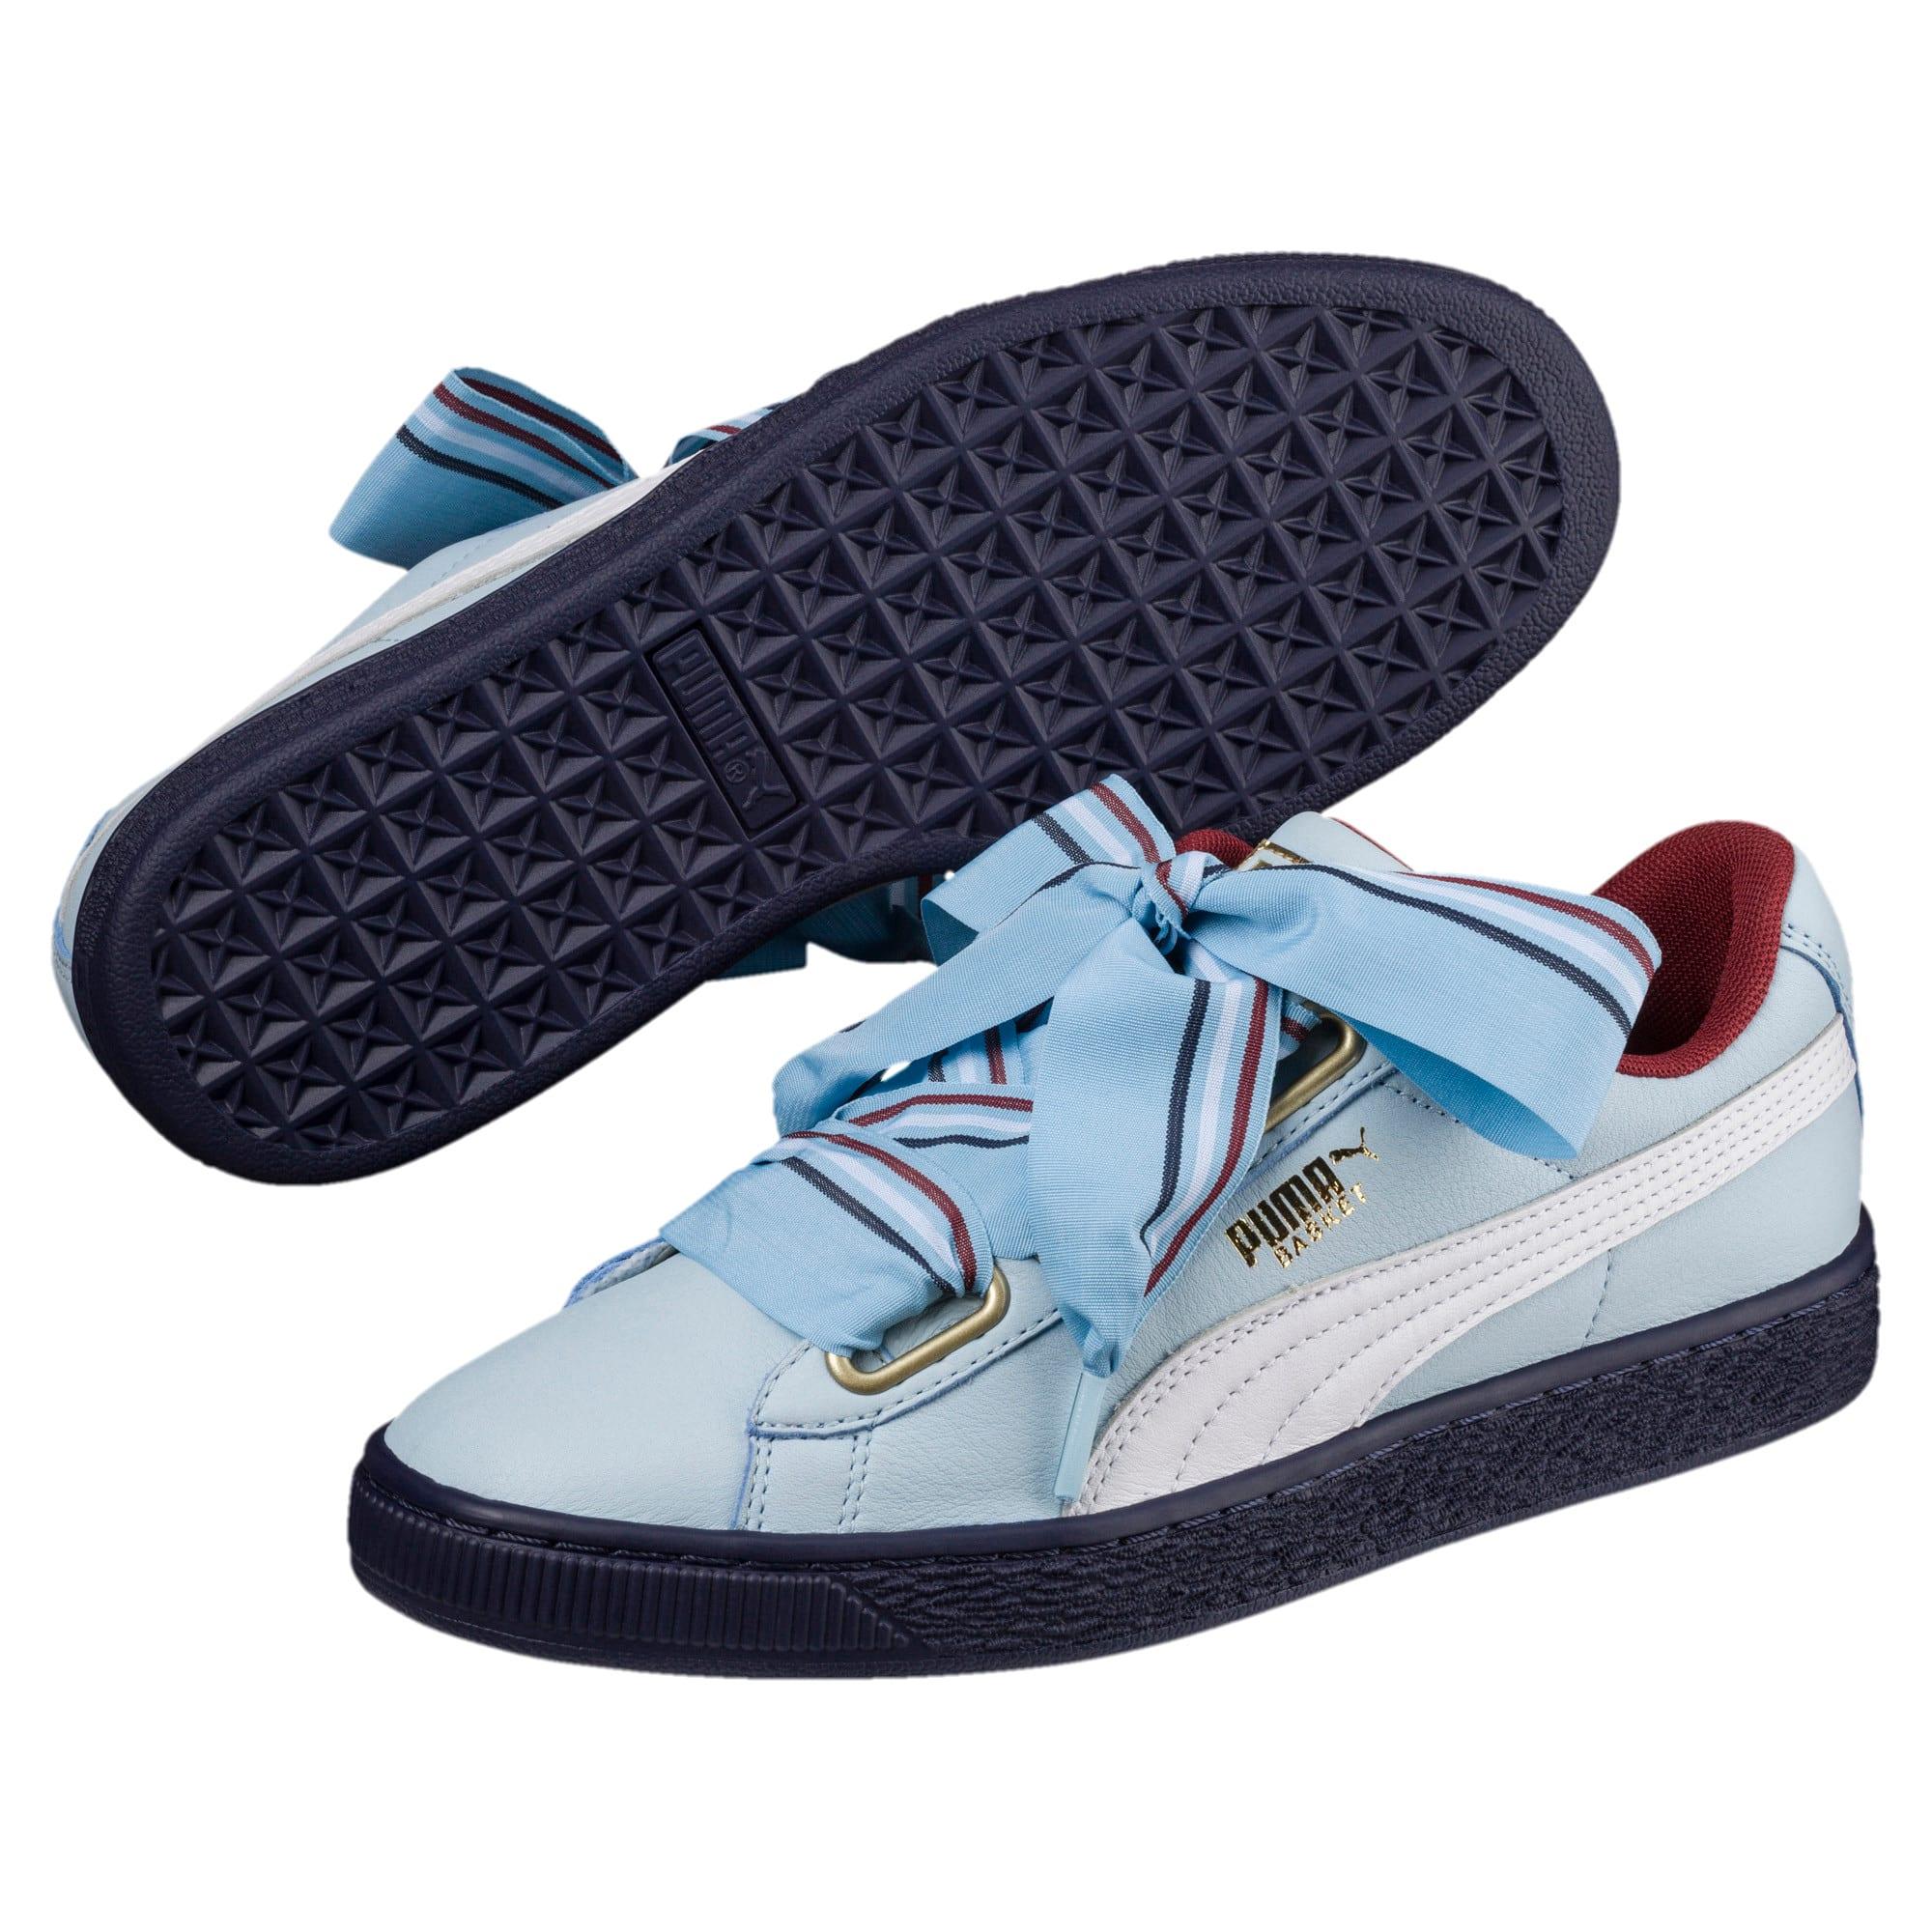 Thumbnail 2 of Basket Heart New School Women's Sneakers, CERULEAN-CERULEAN, medium